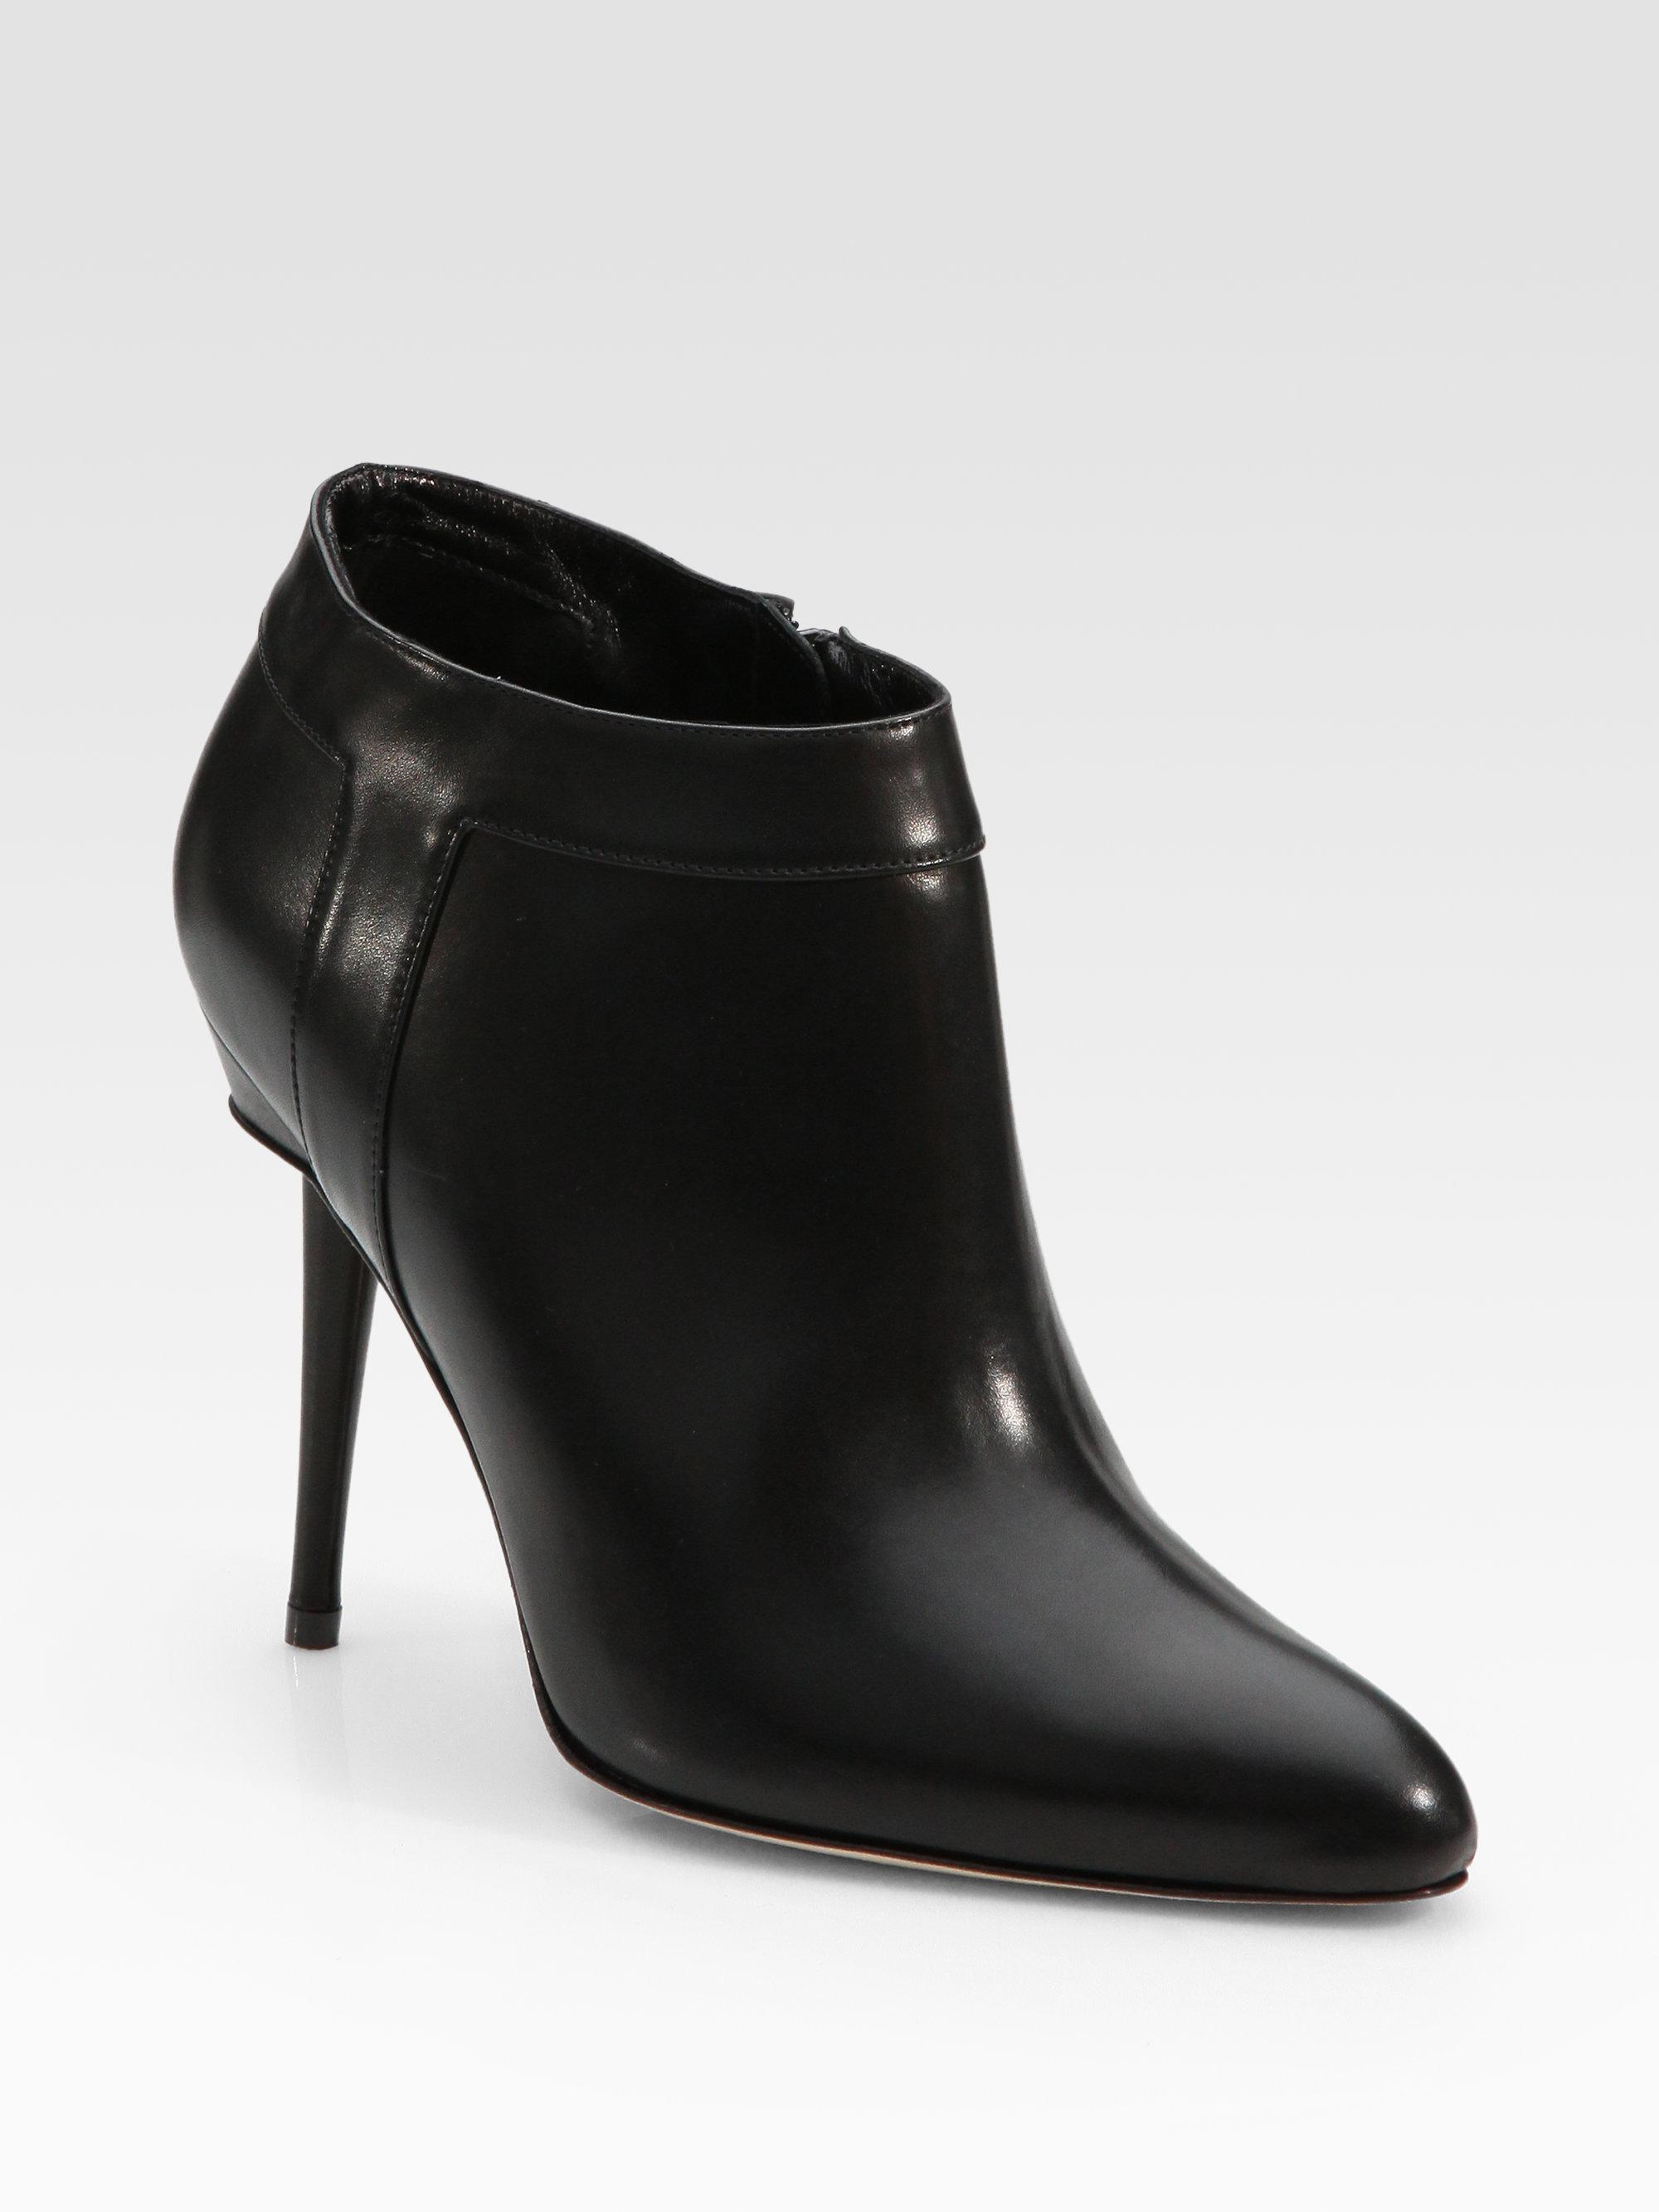 Manolo Blahnik Leather Sidezip Ankle Boots in Black   Lyst